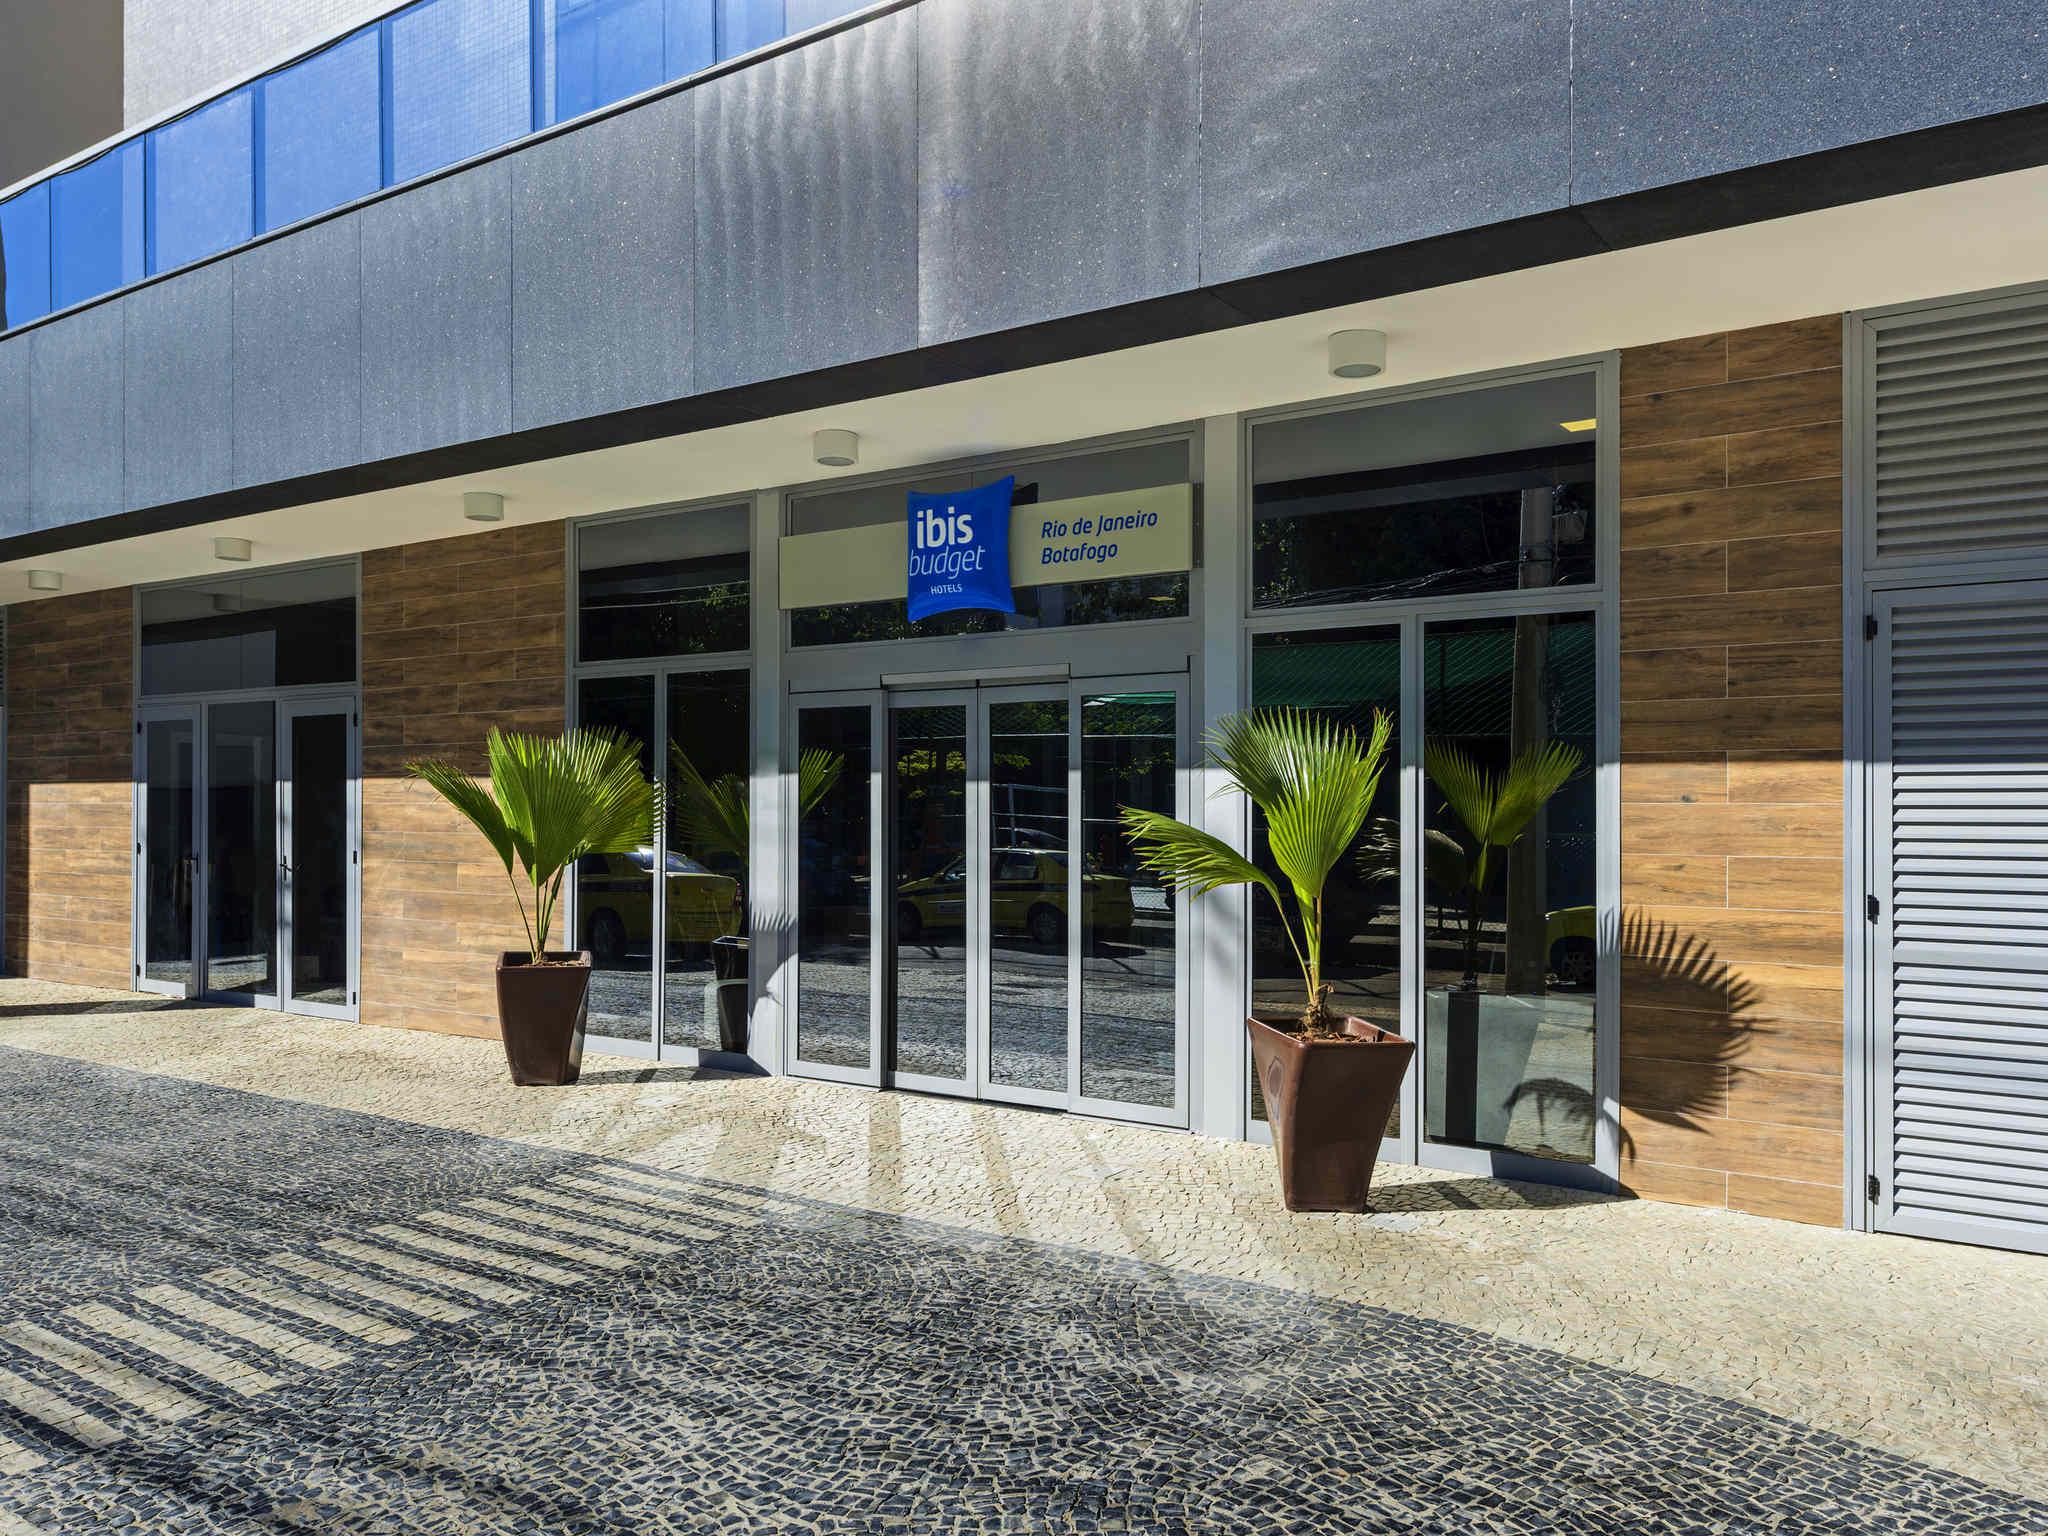 Hotell – Ibis budget RJ Praia de Botafogo